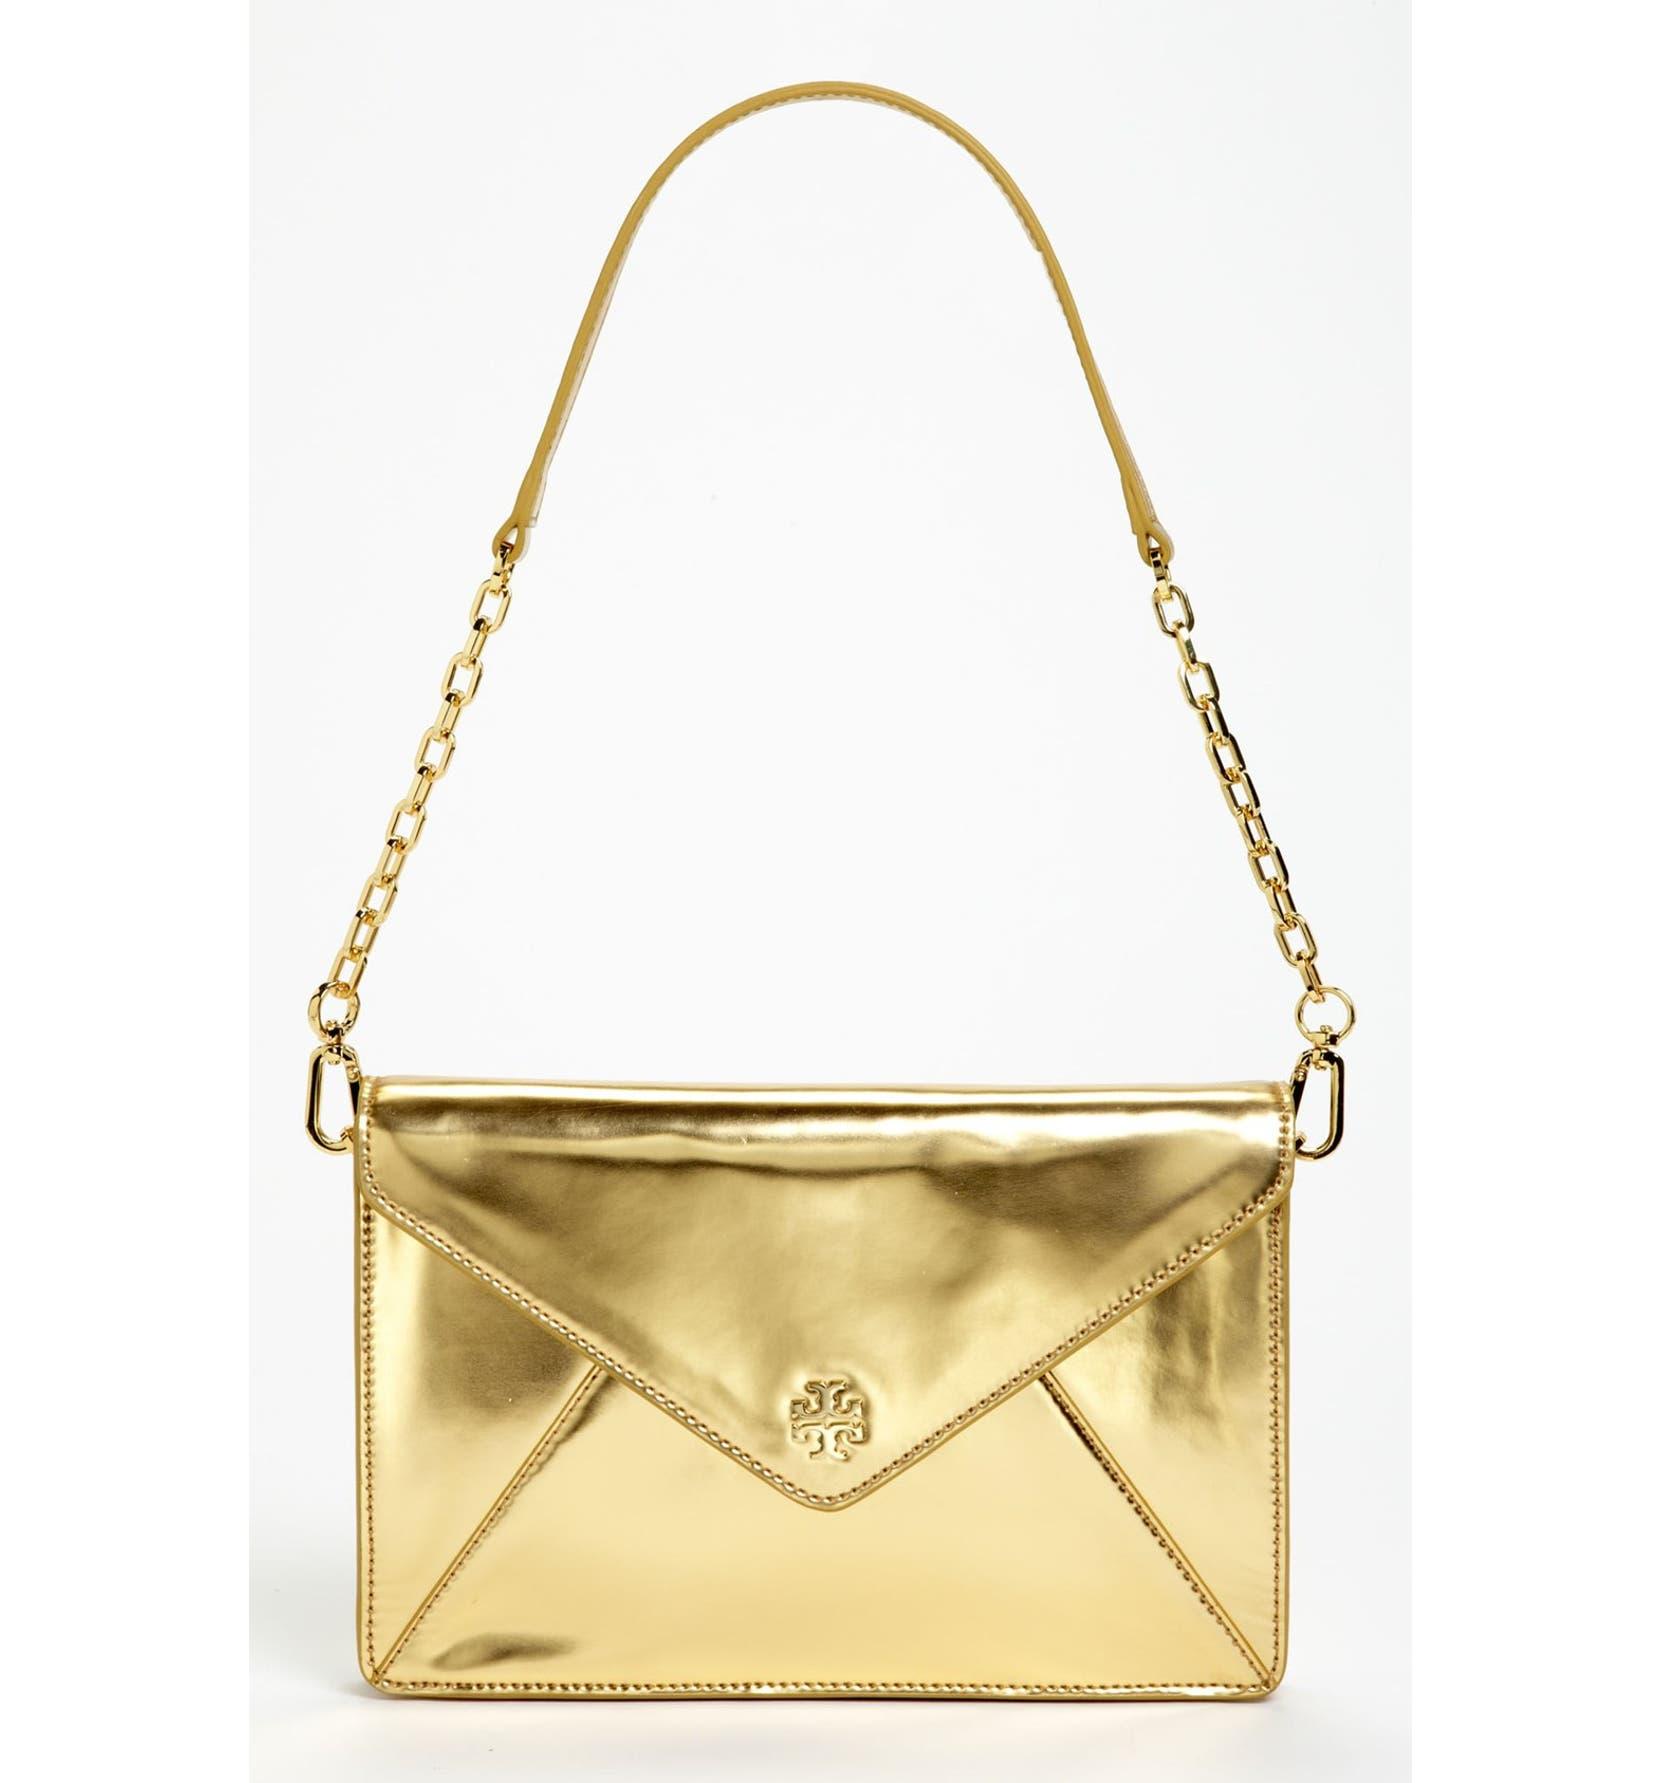 e9764a65bc06 Tory Burch  Viva Vachetti - Large  Leather Envelope Clutch